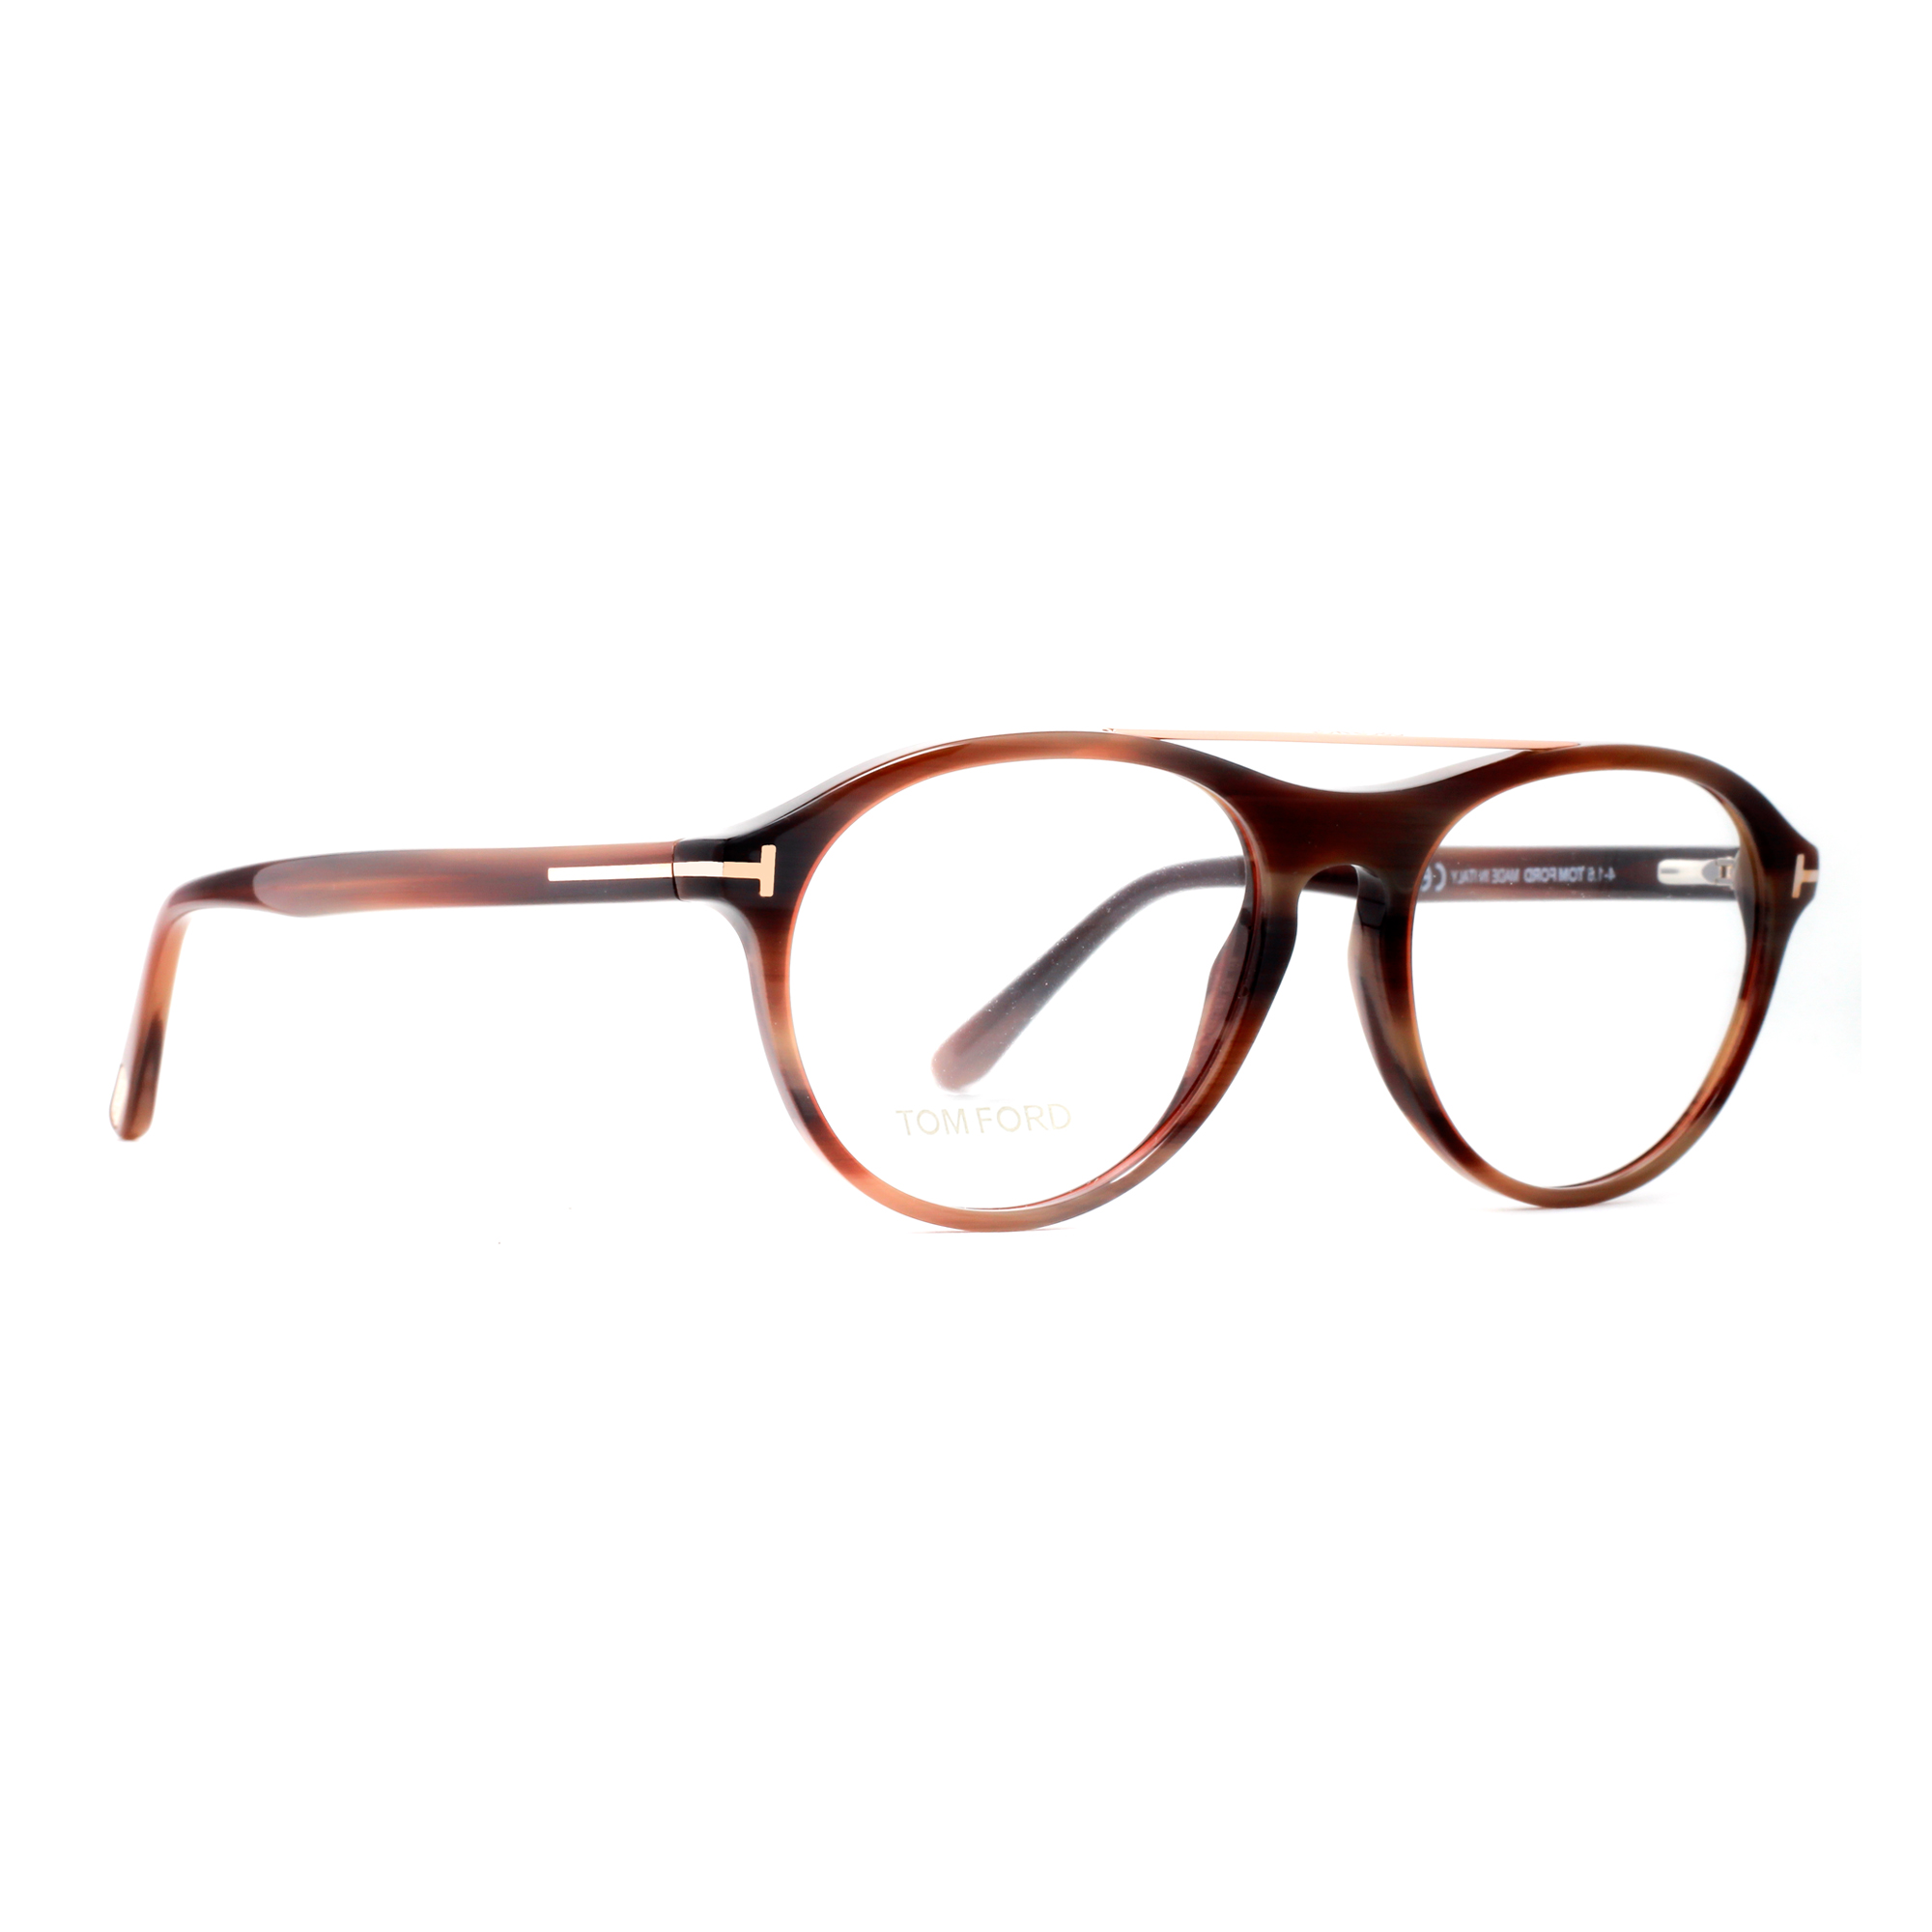 d4cd03e7f48 Tom Ford TF 5411 062 53mm Brown Horn Gold Men s Round Eyeglasses -  Walmart.com